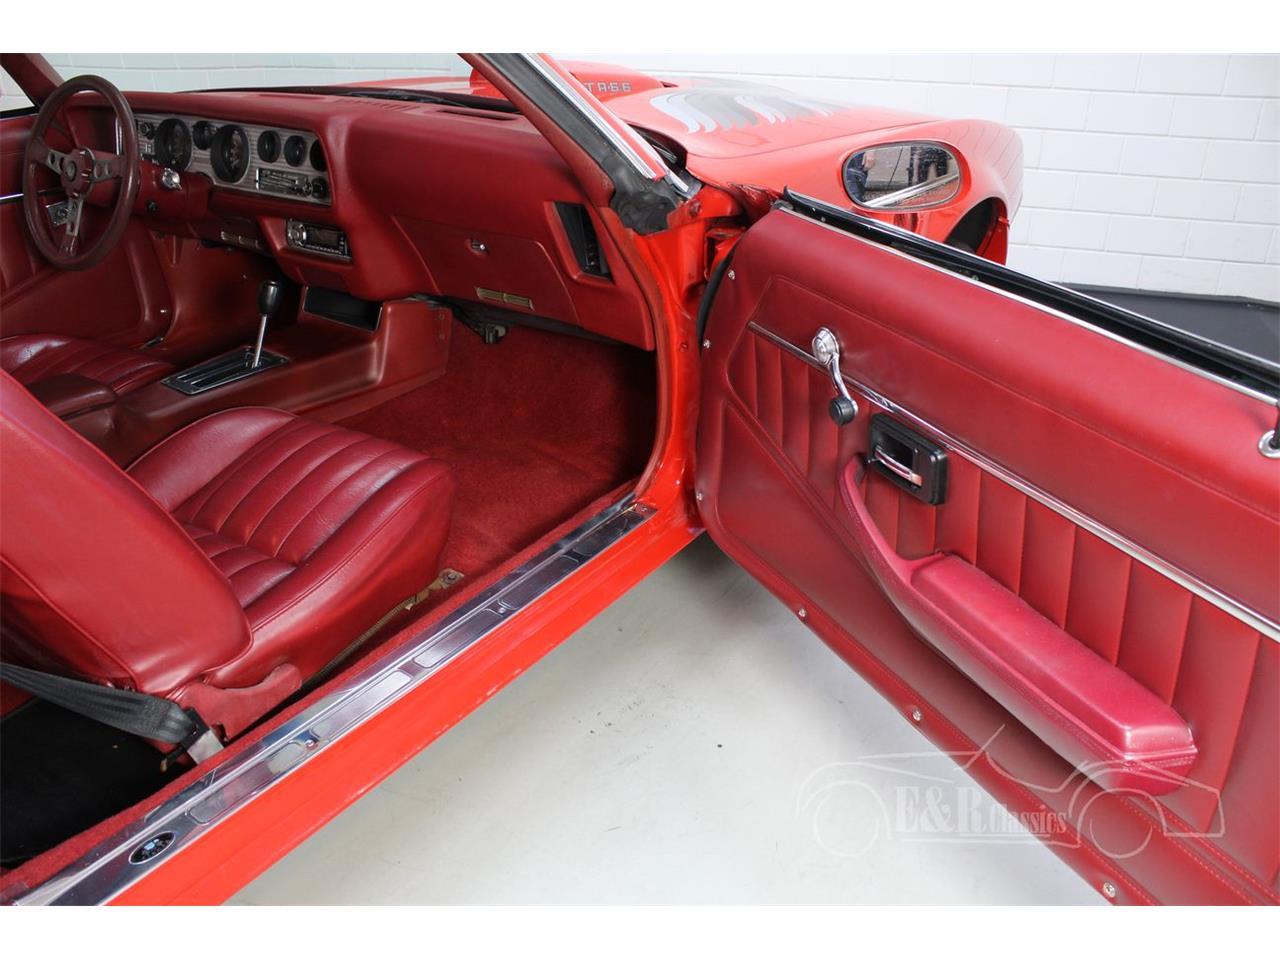 1979 Pontiac Firebird Trans Am (CC-1388399) for sale in Waalwijk, Noord Brabant